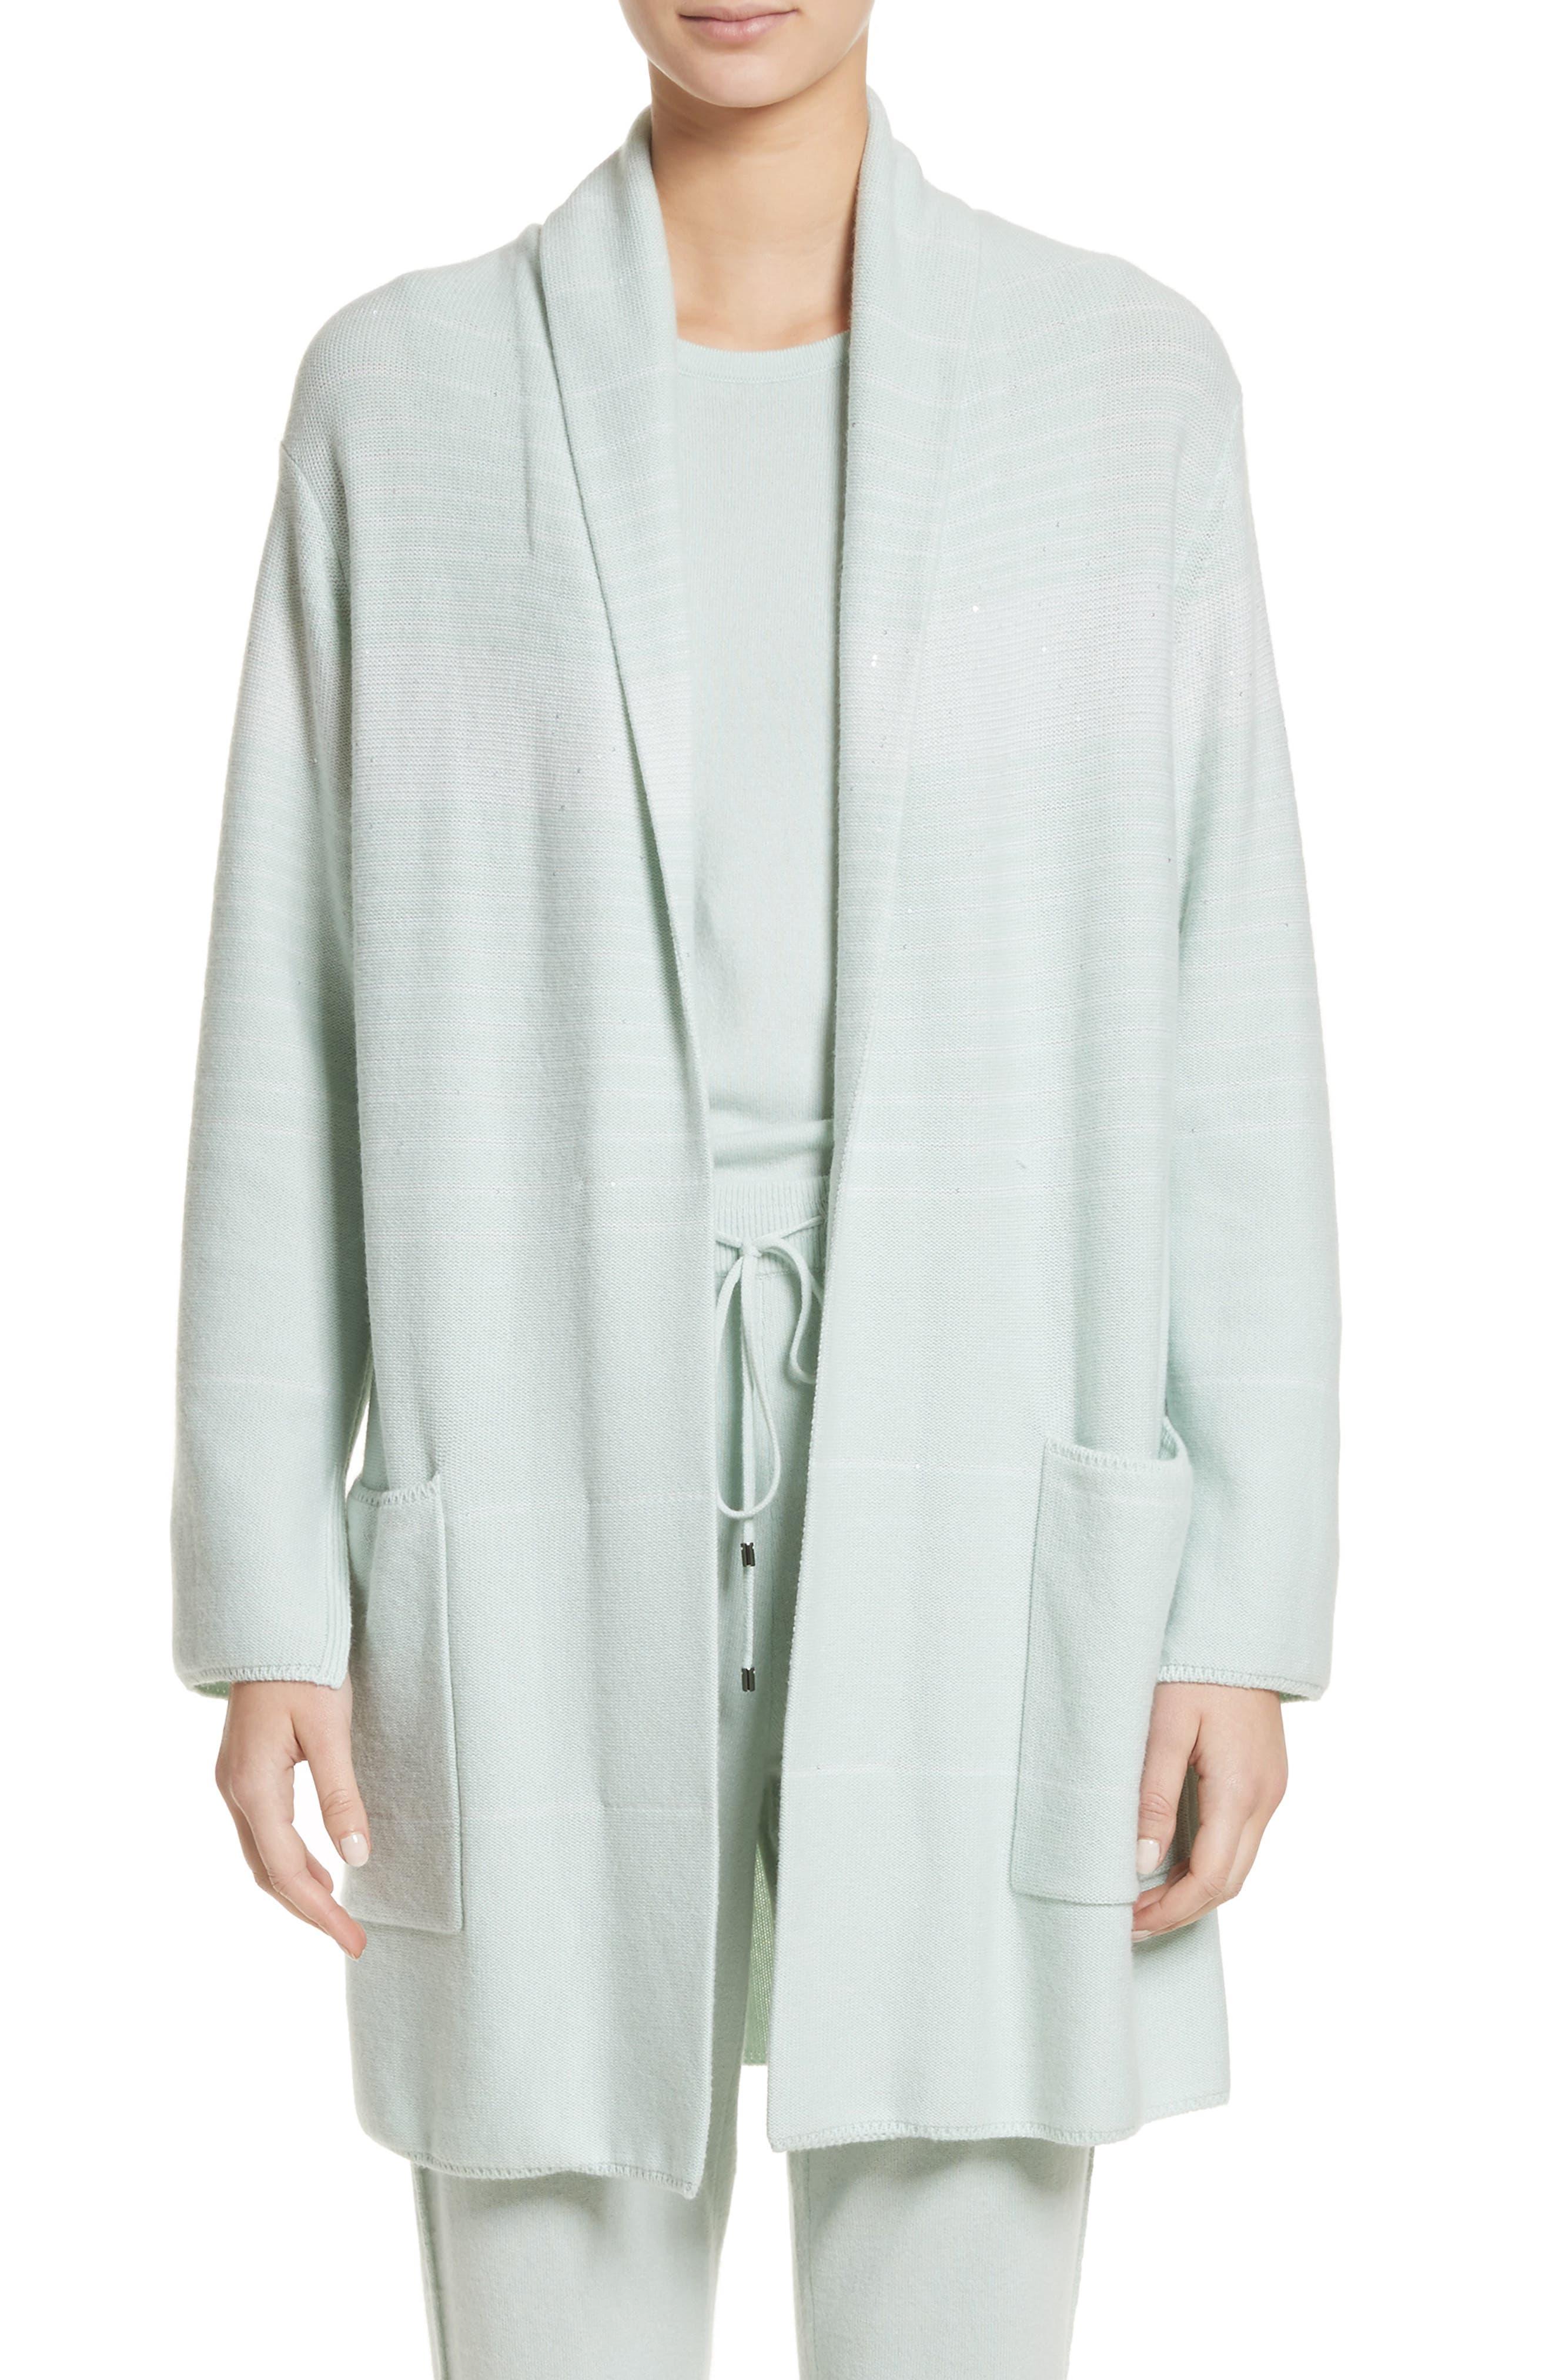 Sequin Cashmere & Silk Cardigan,                             Main thumbnail 1, color,                             Mint/ Cream